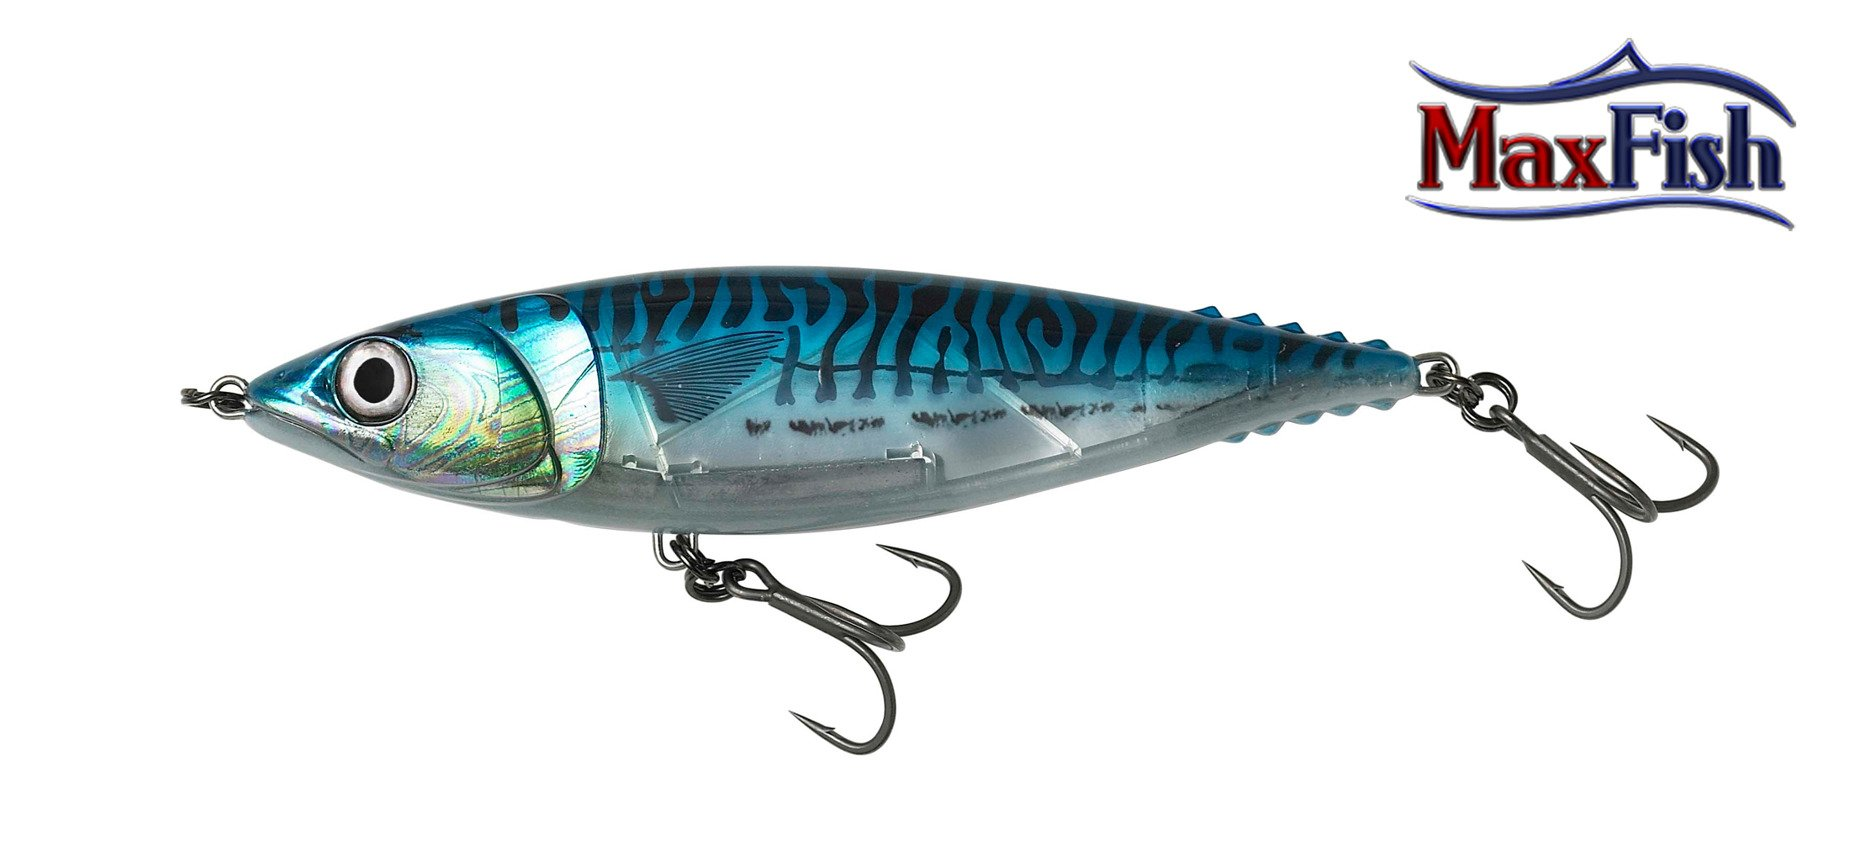 Savage Gear Jerk 3d Mack Stick - Blue Mackerel 13.0 cm